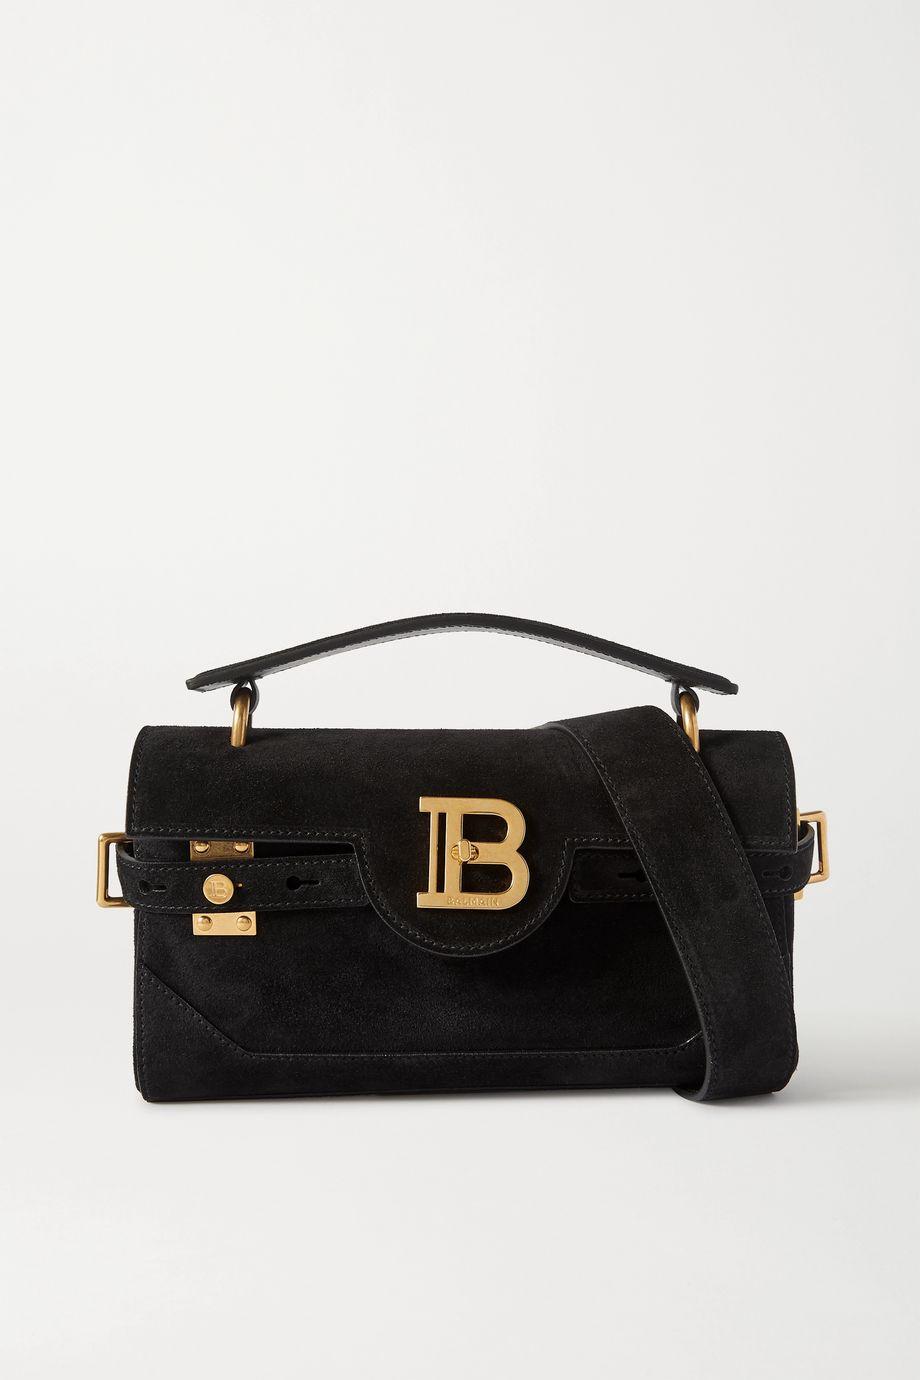 Balmain B-Buzz 26 medium suede shoulder bag